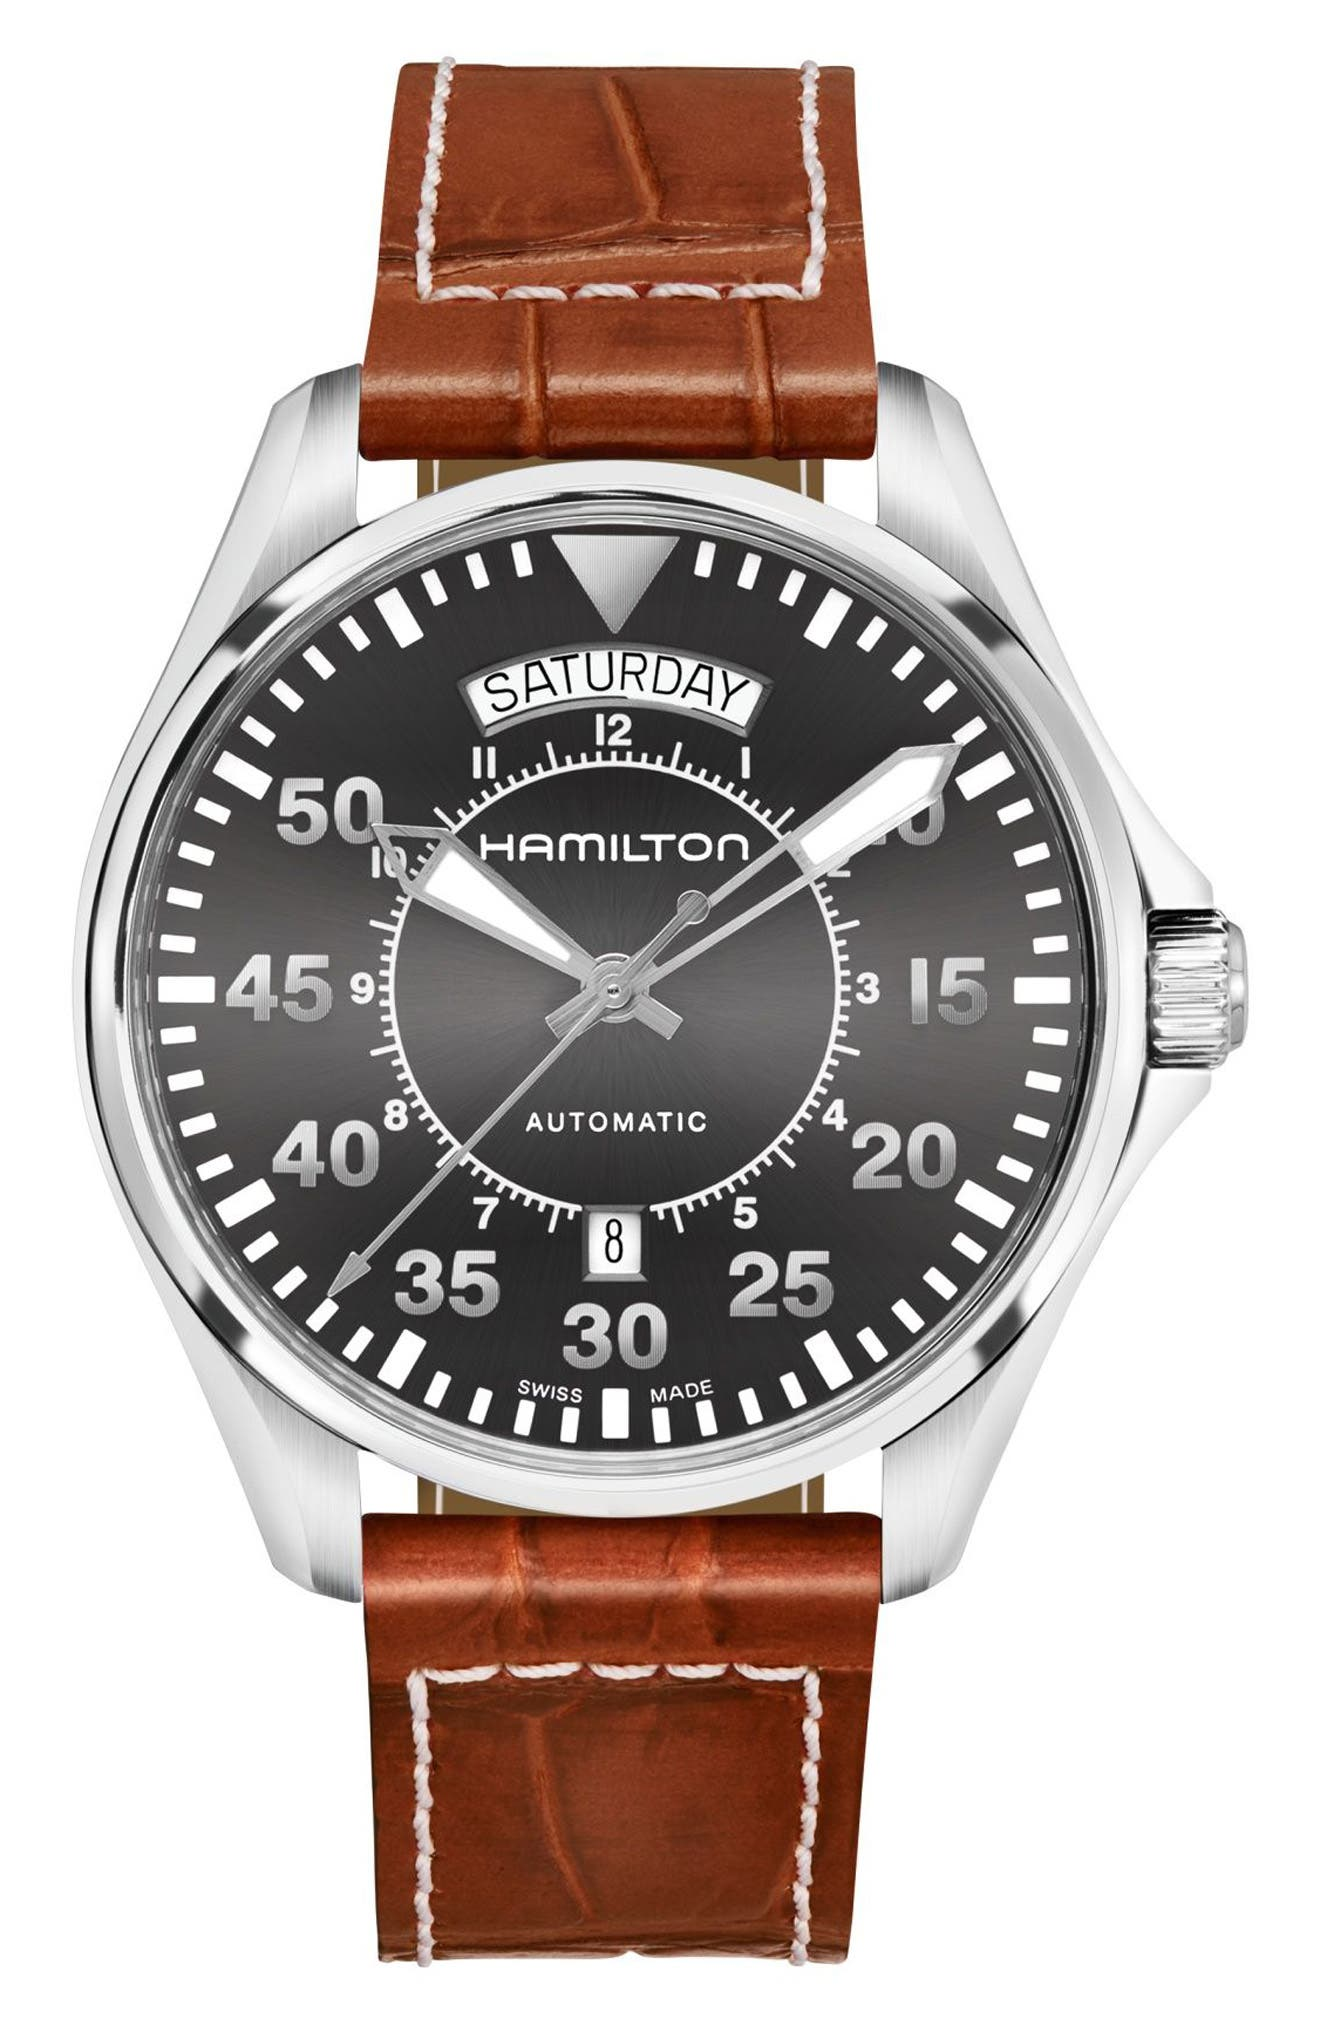 Main Image - Hamilton Khaki Pilot Automatic Leather Strap Watch, 42mm